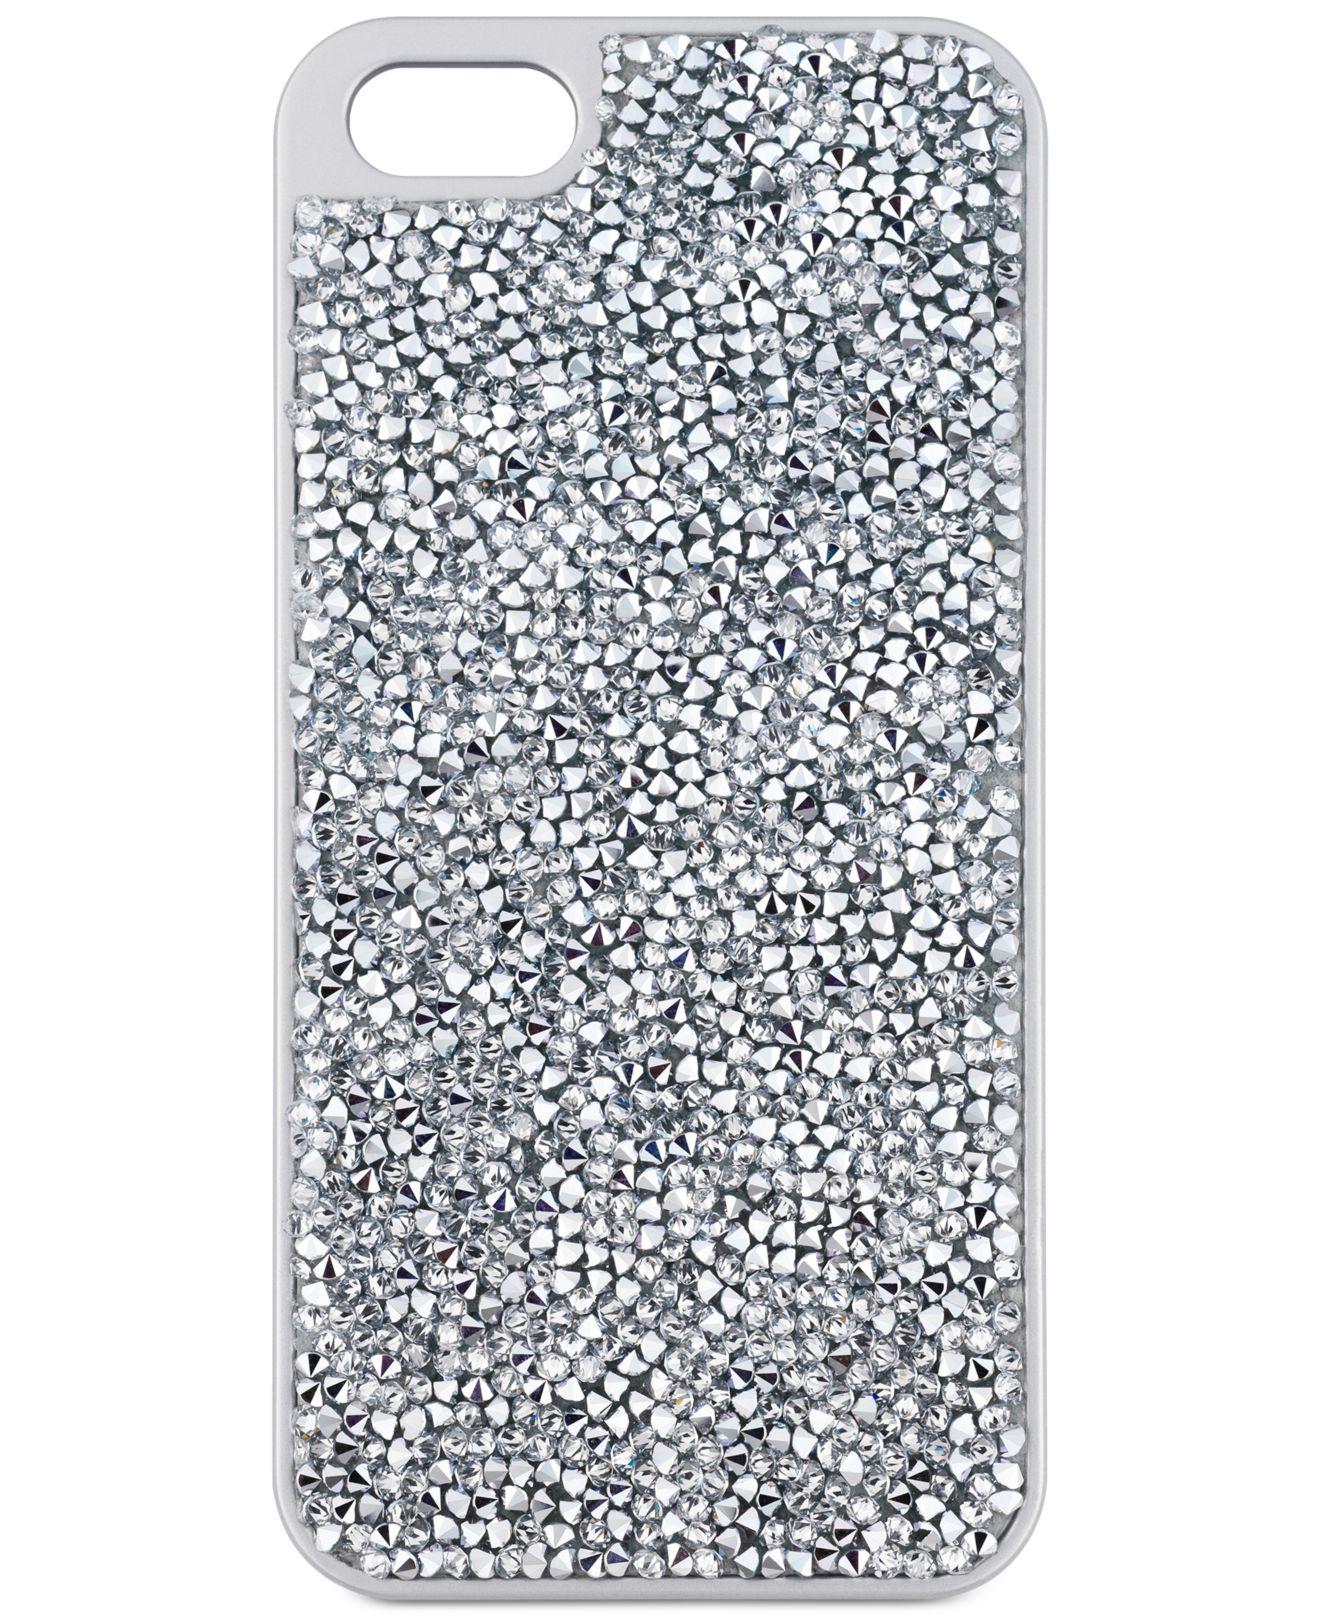 the latest afdc3 1f9d1 Swarovski Metallic Silver-tone Glam Rock Iphone 6 Case